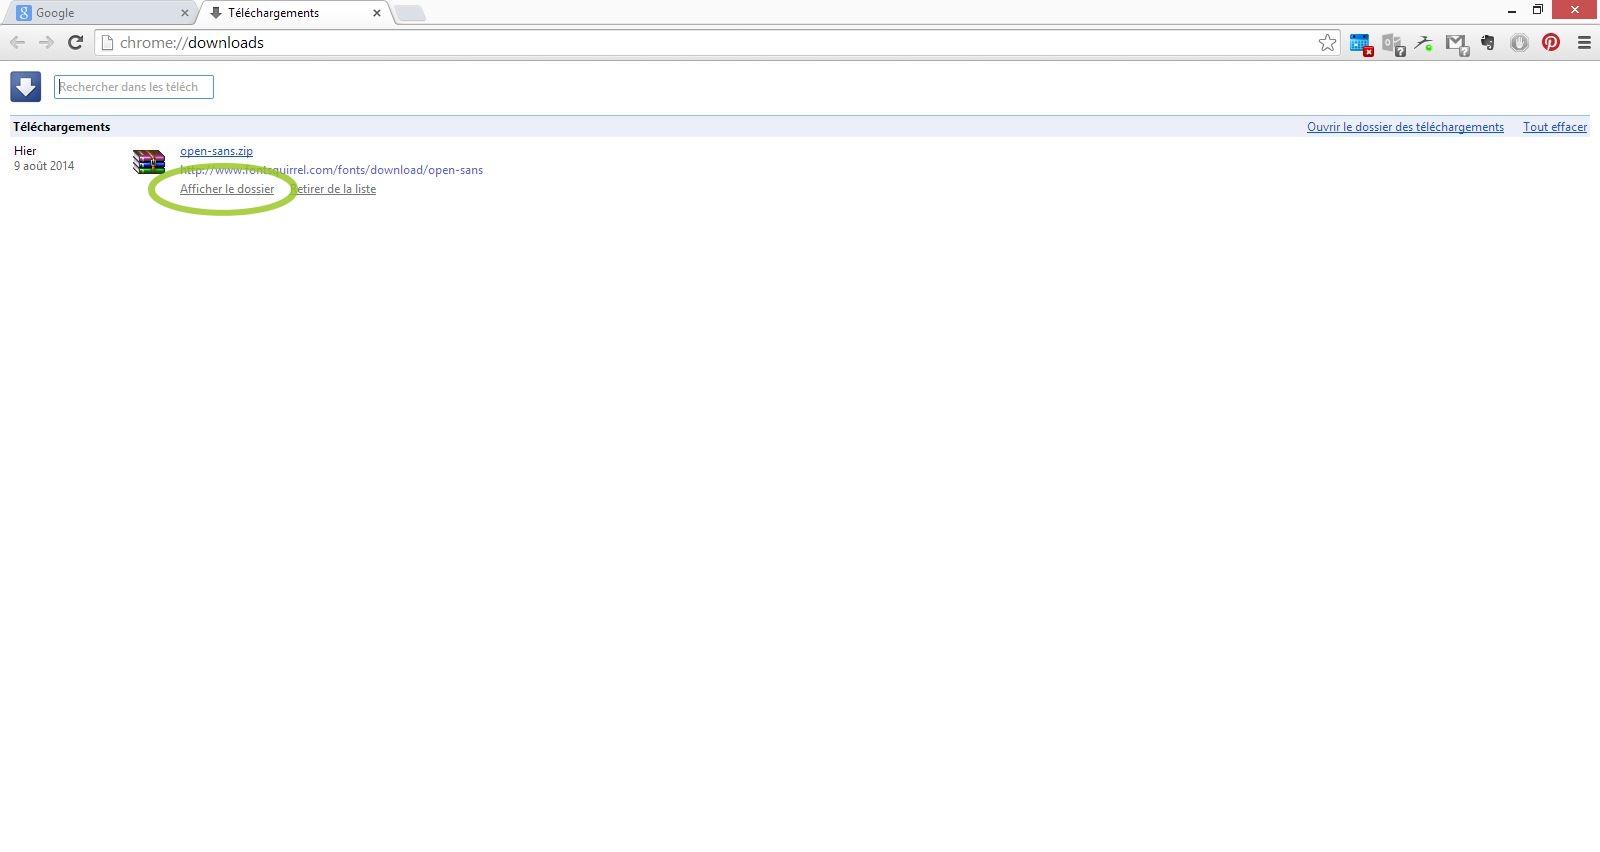 fichier persu (3)